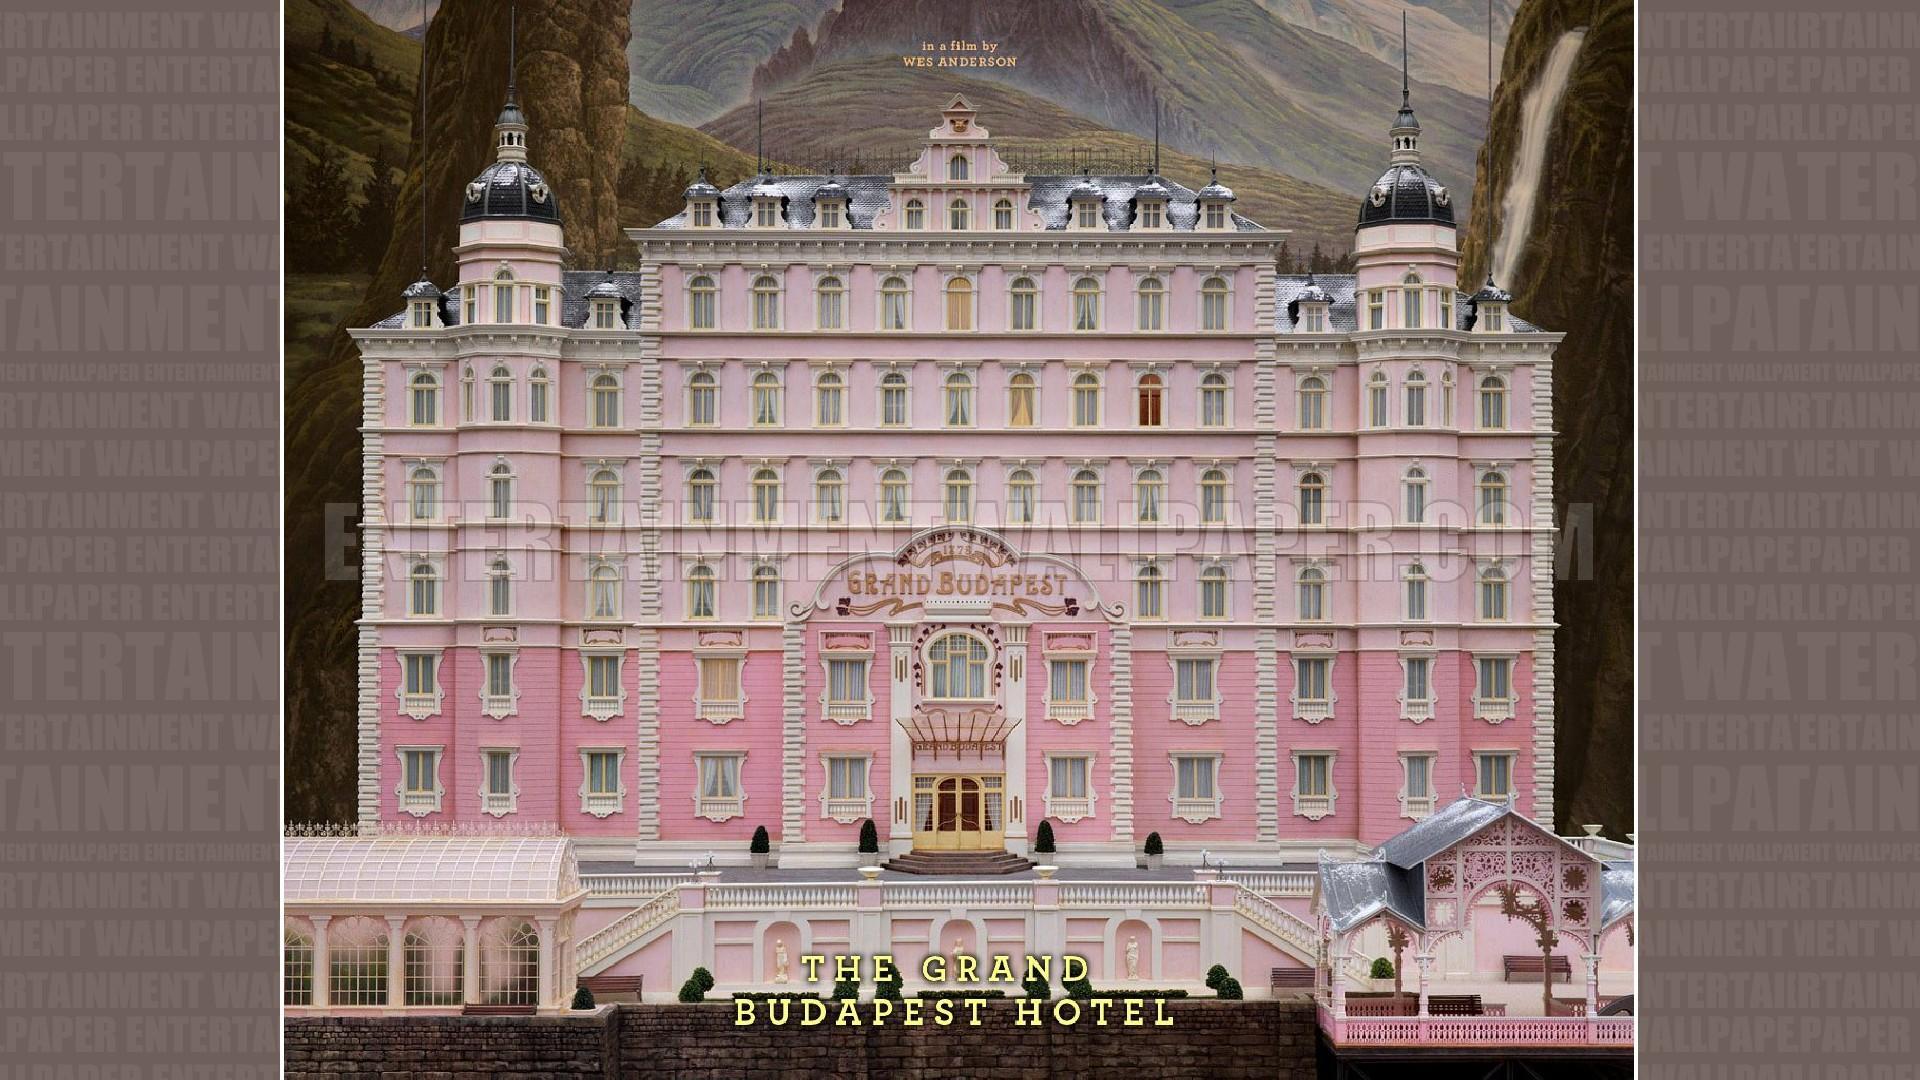 Grand Budapest Hotel Wallpaper   Grand Budapest Hotel Hd 1920x1080